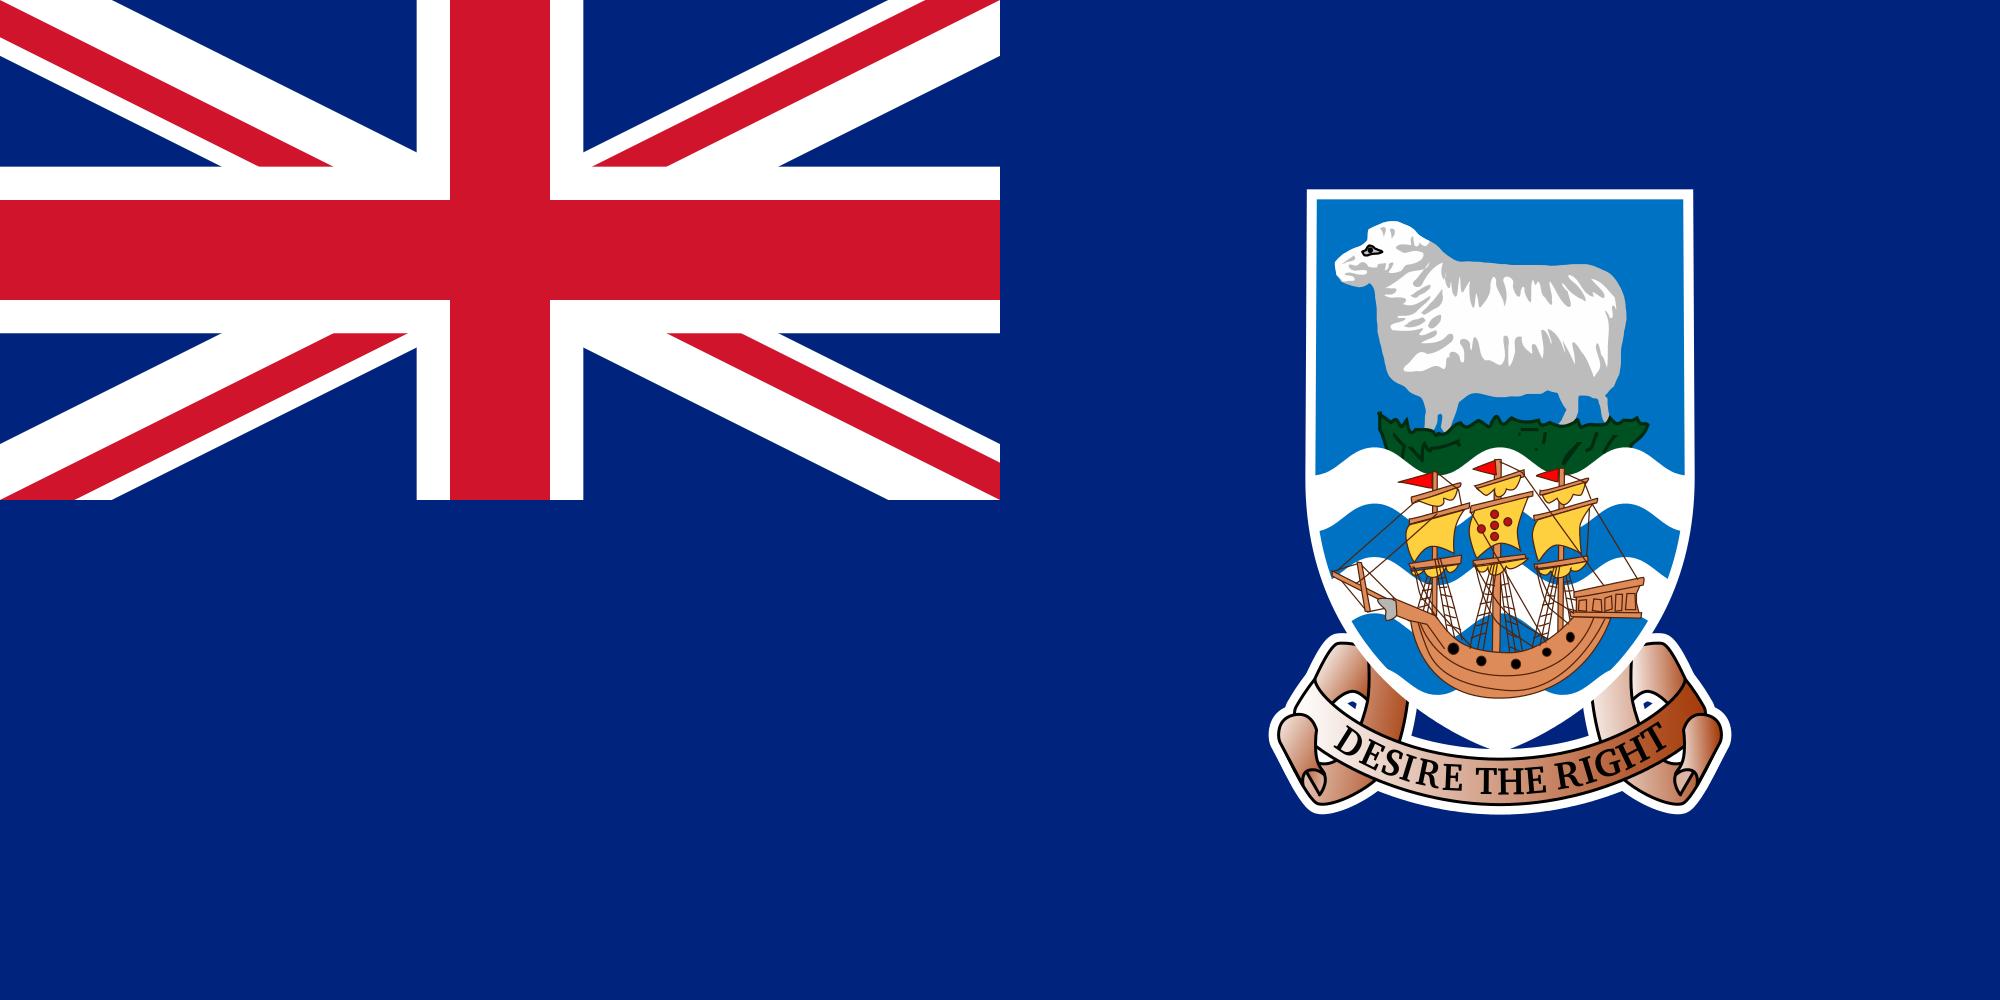 islas malvinas, paese, emblema, logo, simbolo - Sfondi HD - Professor-falken.com